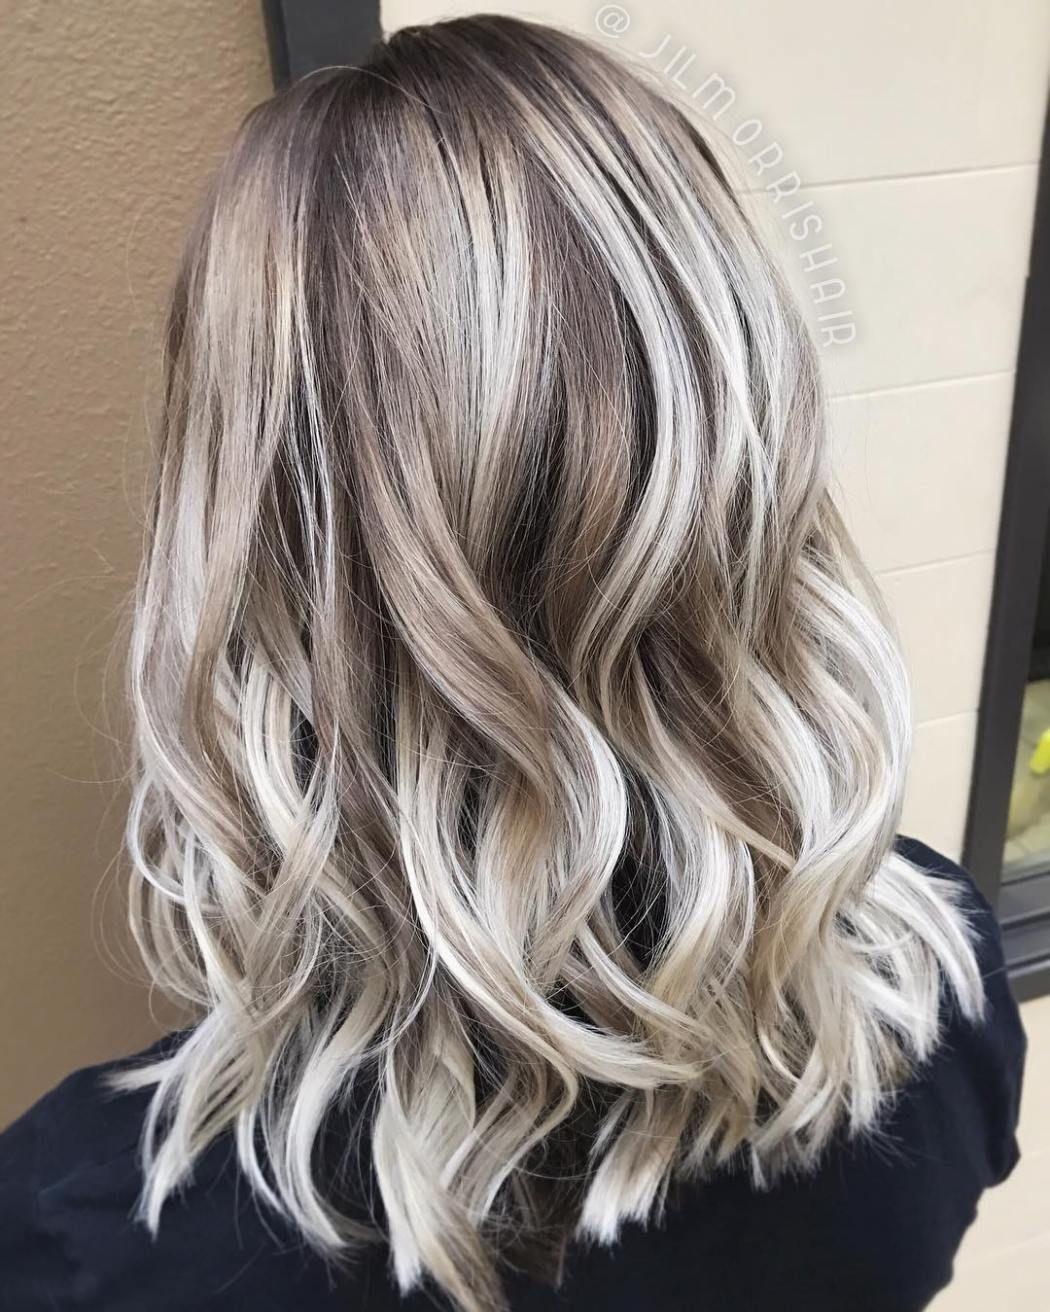 Bronde Hair With Platinum Highlights Ash Blonde Balayage Brown Hair With Silver Highlights Hair Color Dark